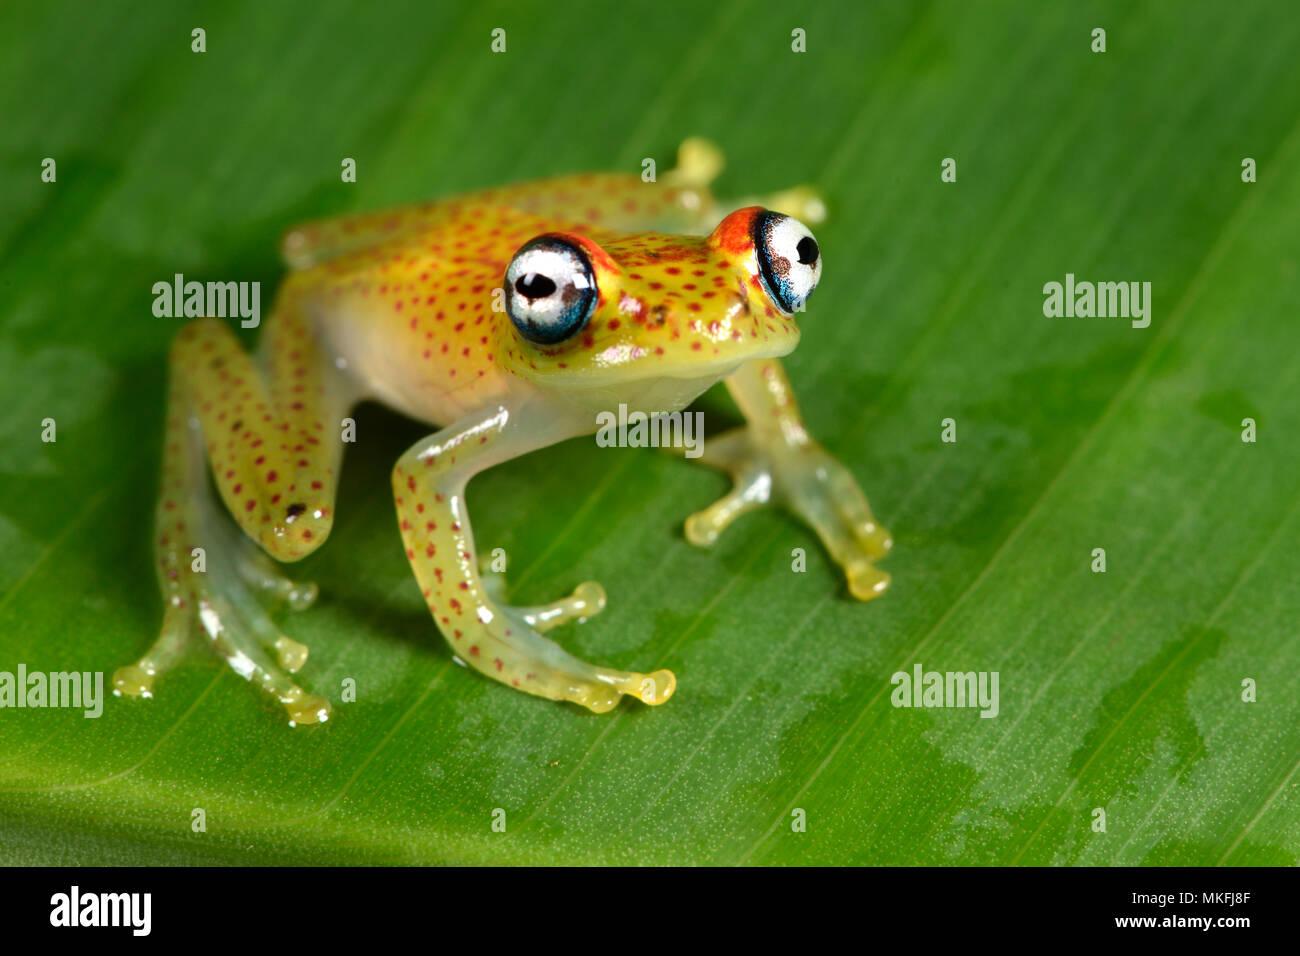 Red-spotted treefrog (Boophis tasymena), Andasibe, Perinet, Alaotra-Mangoro Region, Madagascar - Stock Image